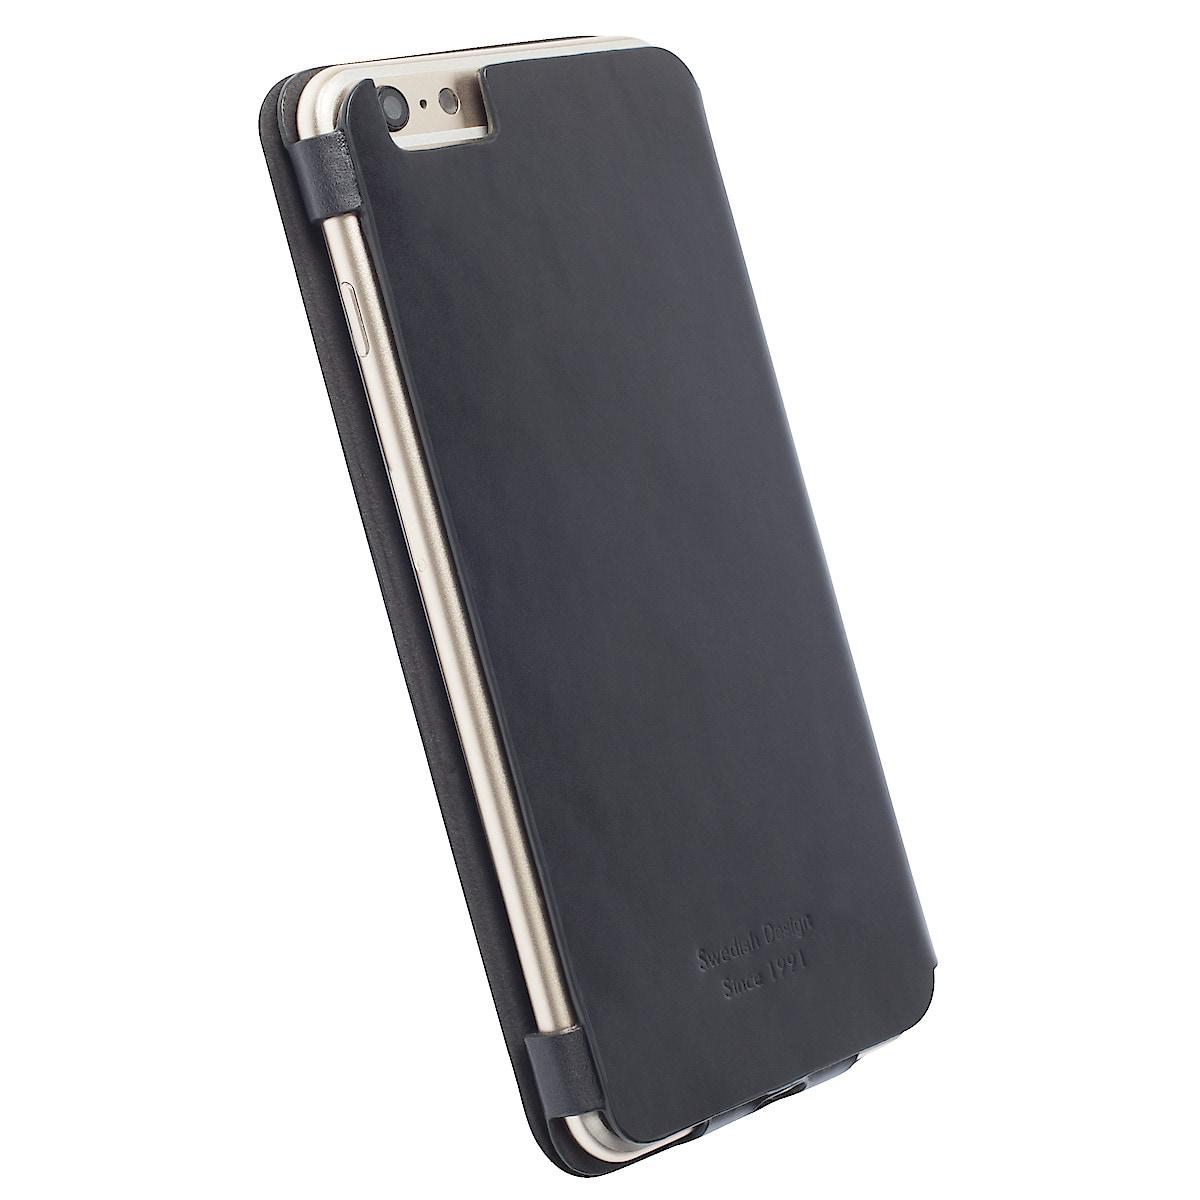 Krusell Kiruna FlipCover Case for iPhone 6 Plus/6S Plus